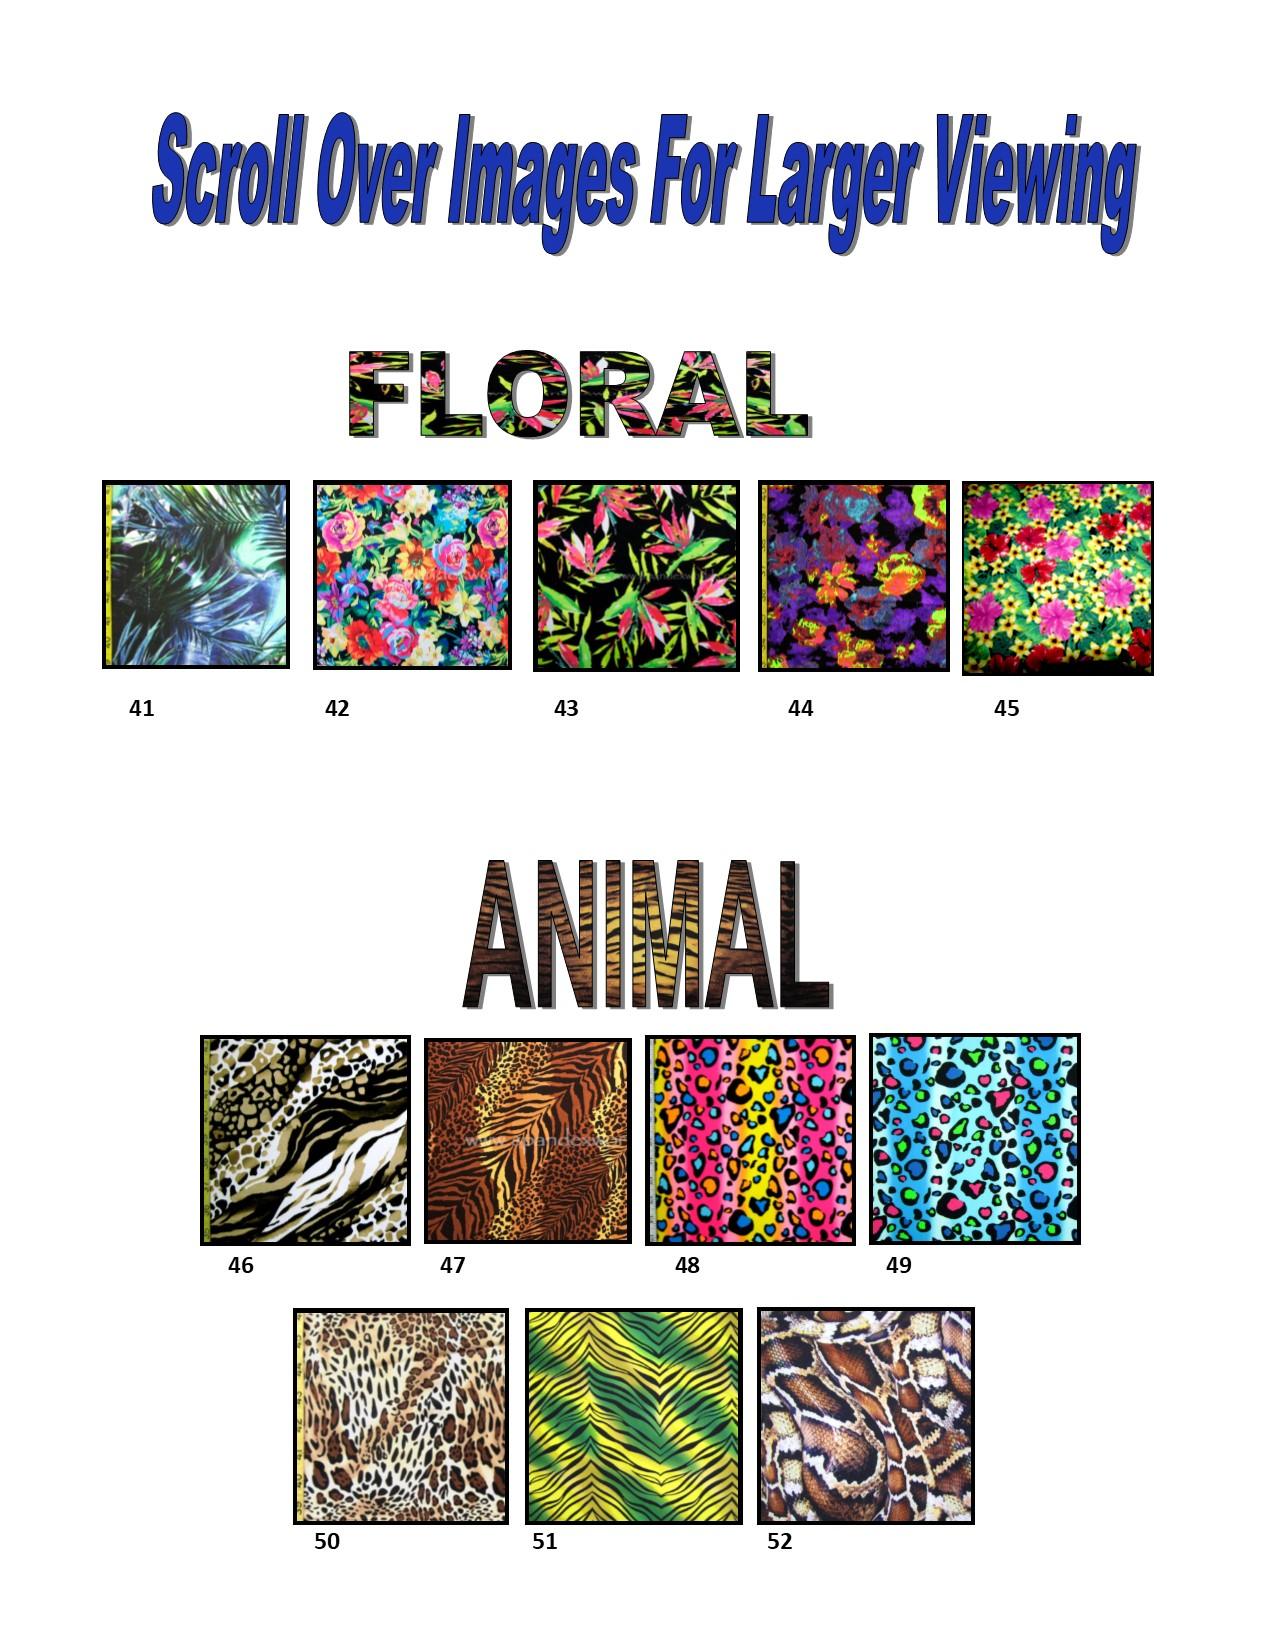 animalnfloral.jpg